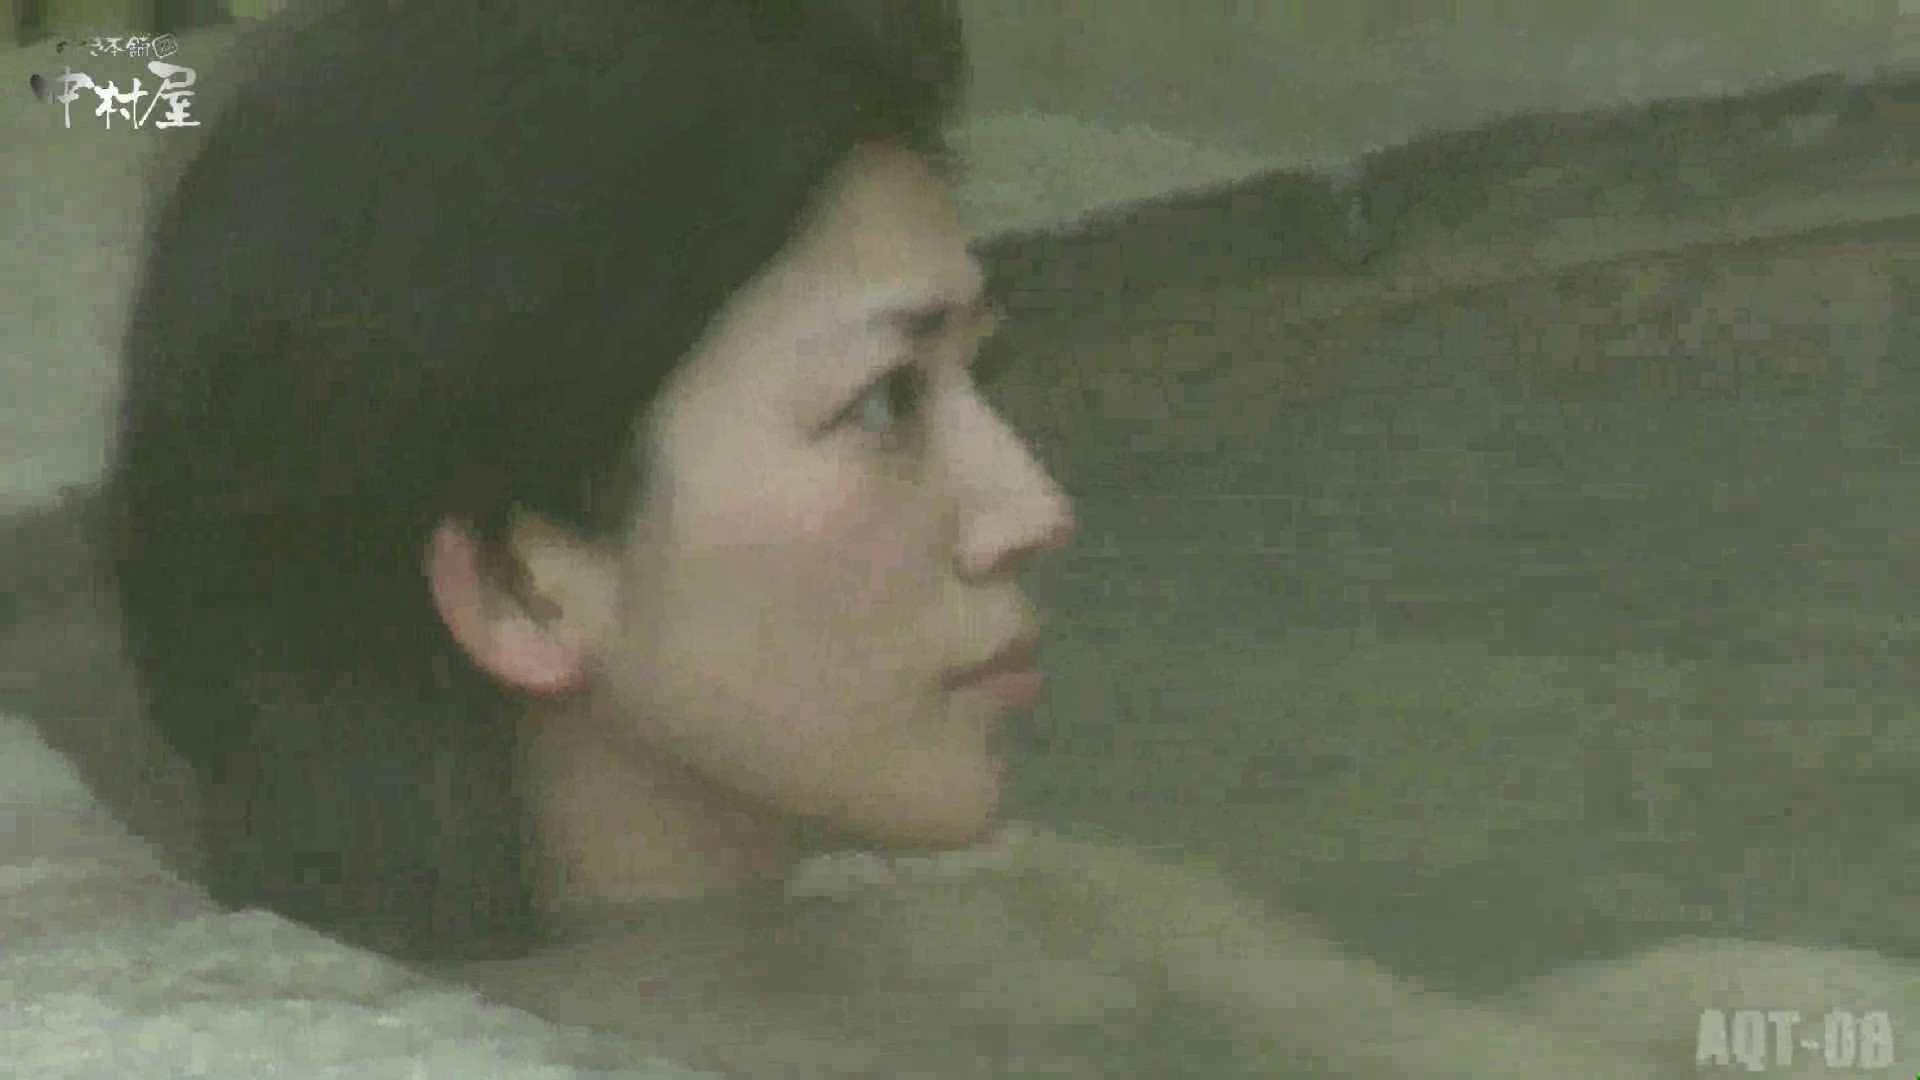 Aquaな露天風呂Vol.872潜入盗撮露天風呂八判湯 其の四 HなOL | 盗撮  85pic 52